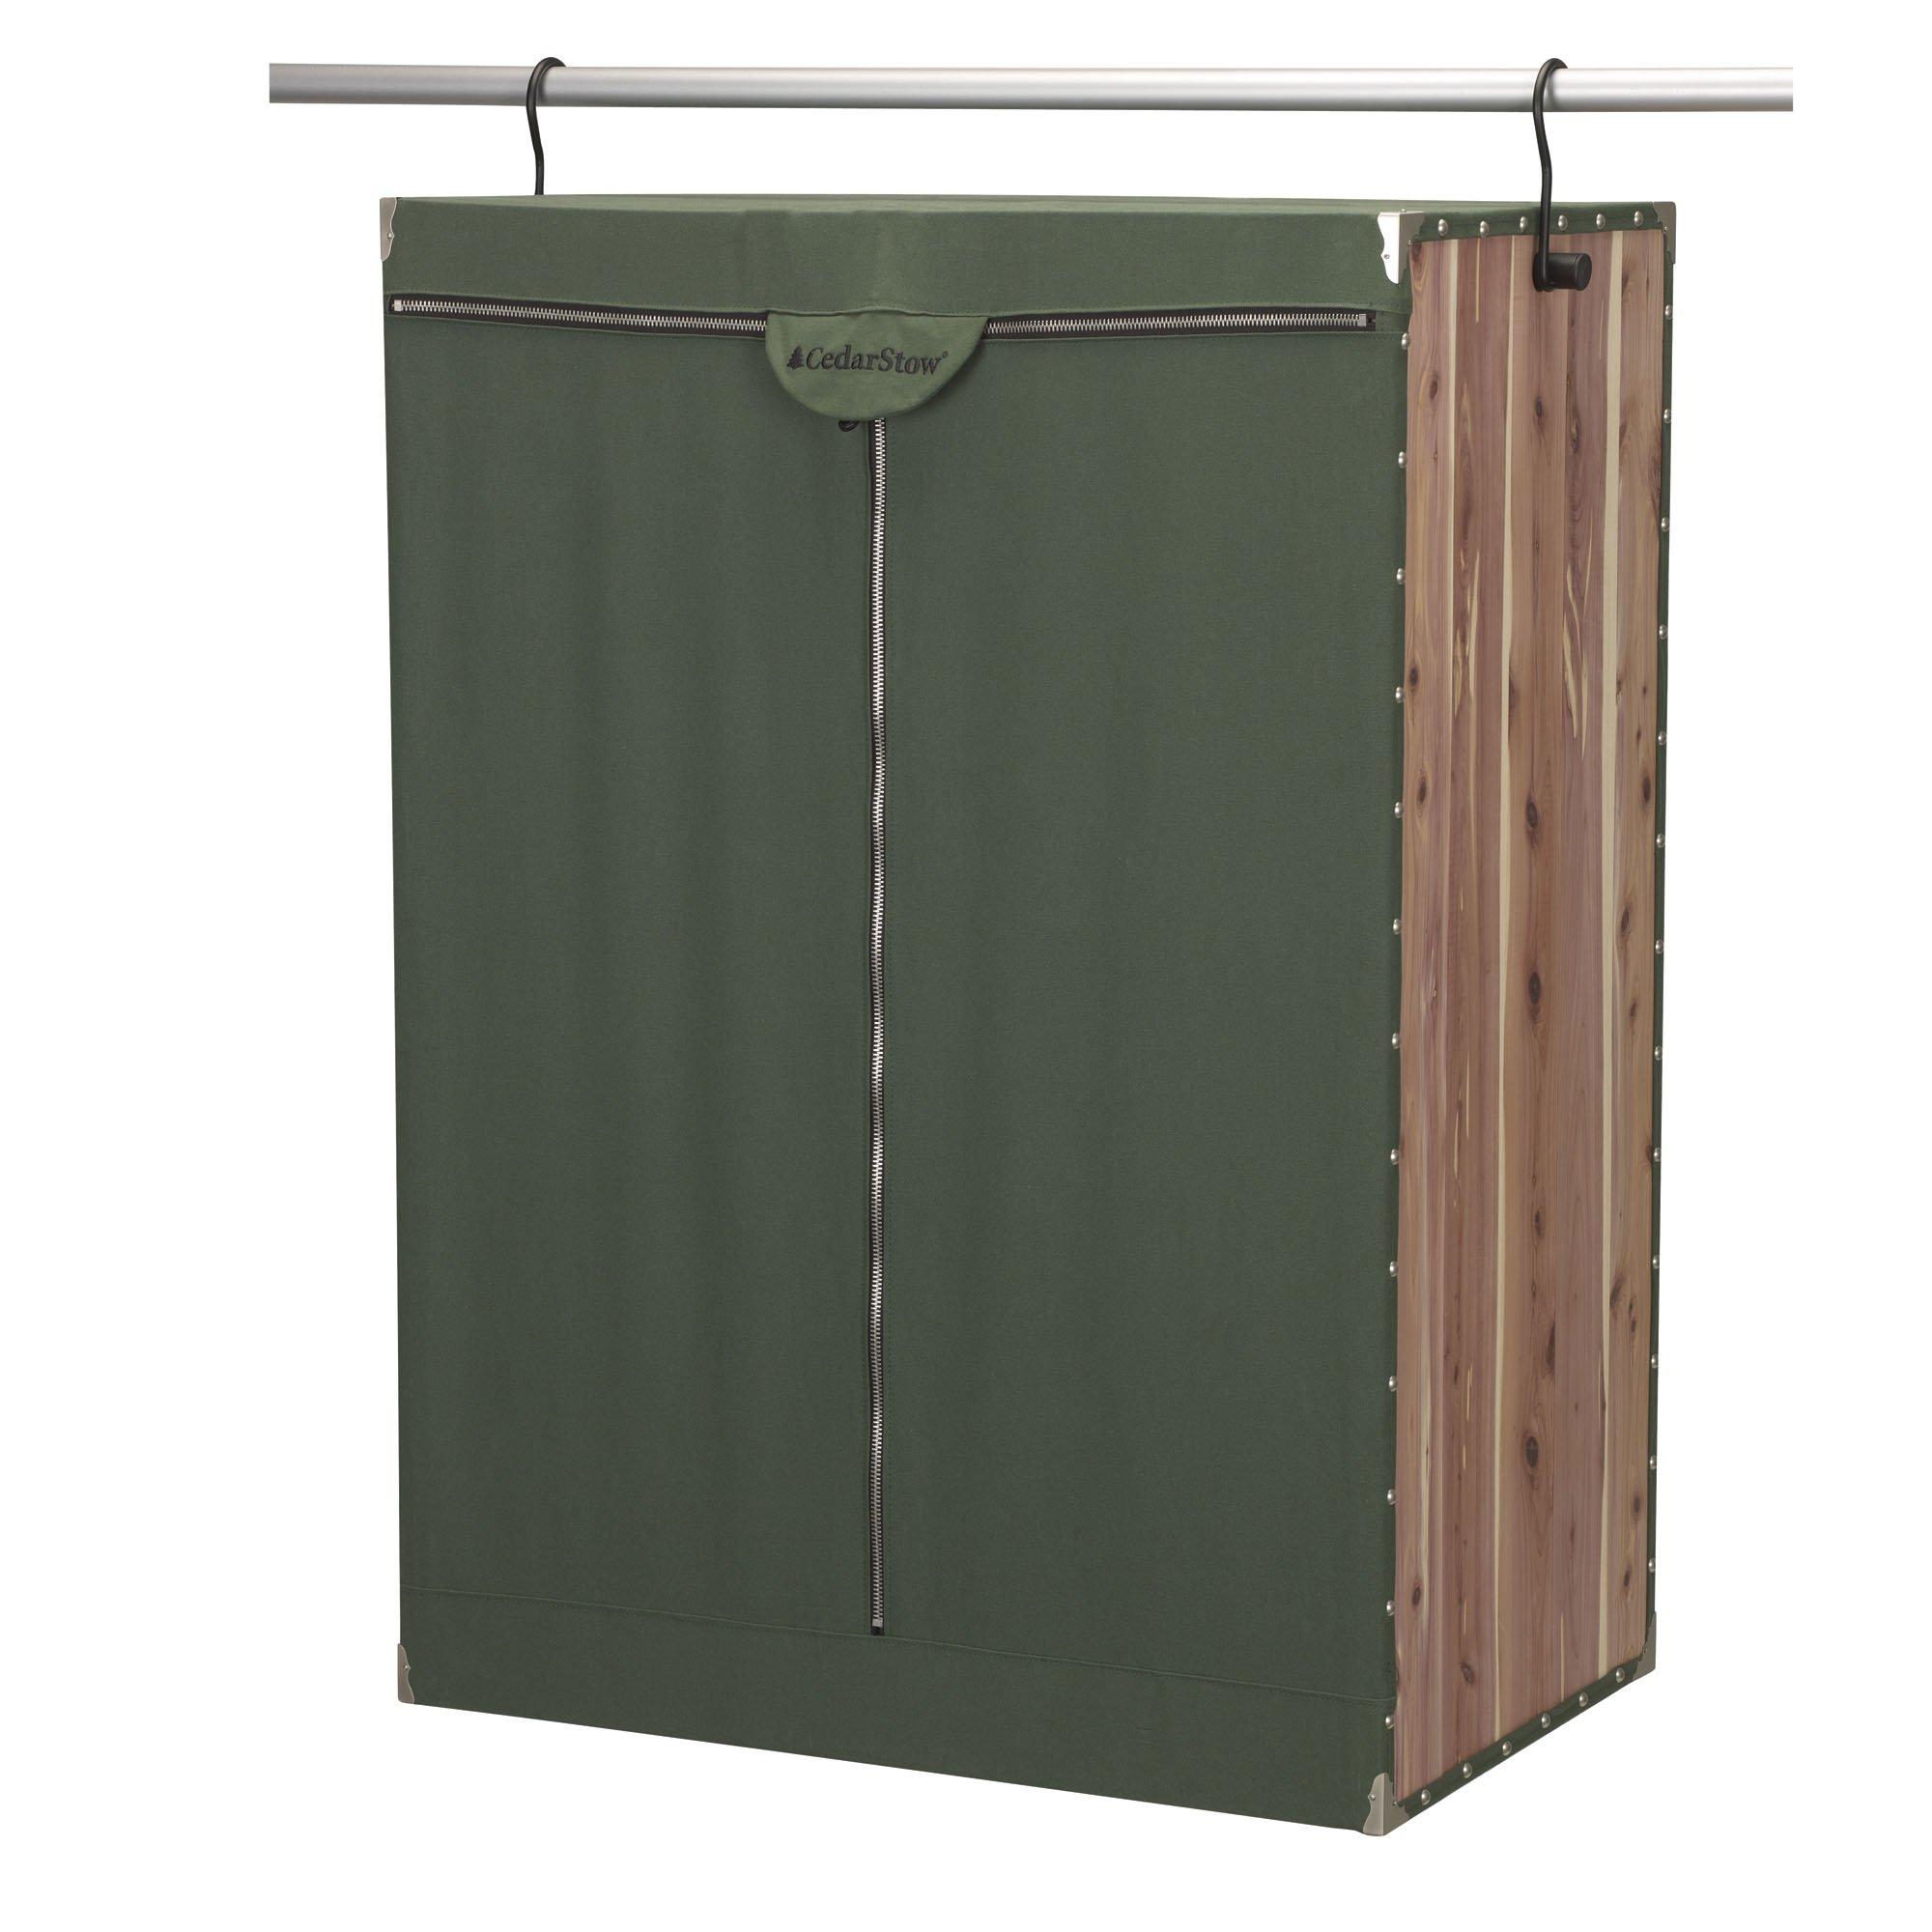 Household Essentials 2534-1 CedarStow Premier Garment Wardrobe | X-Wide | Cedar Green